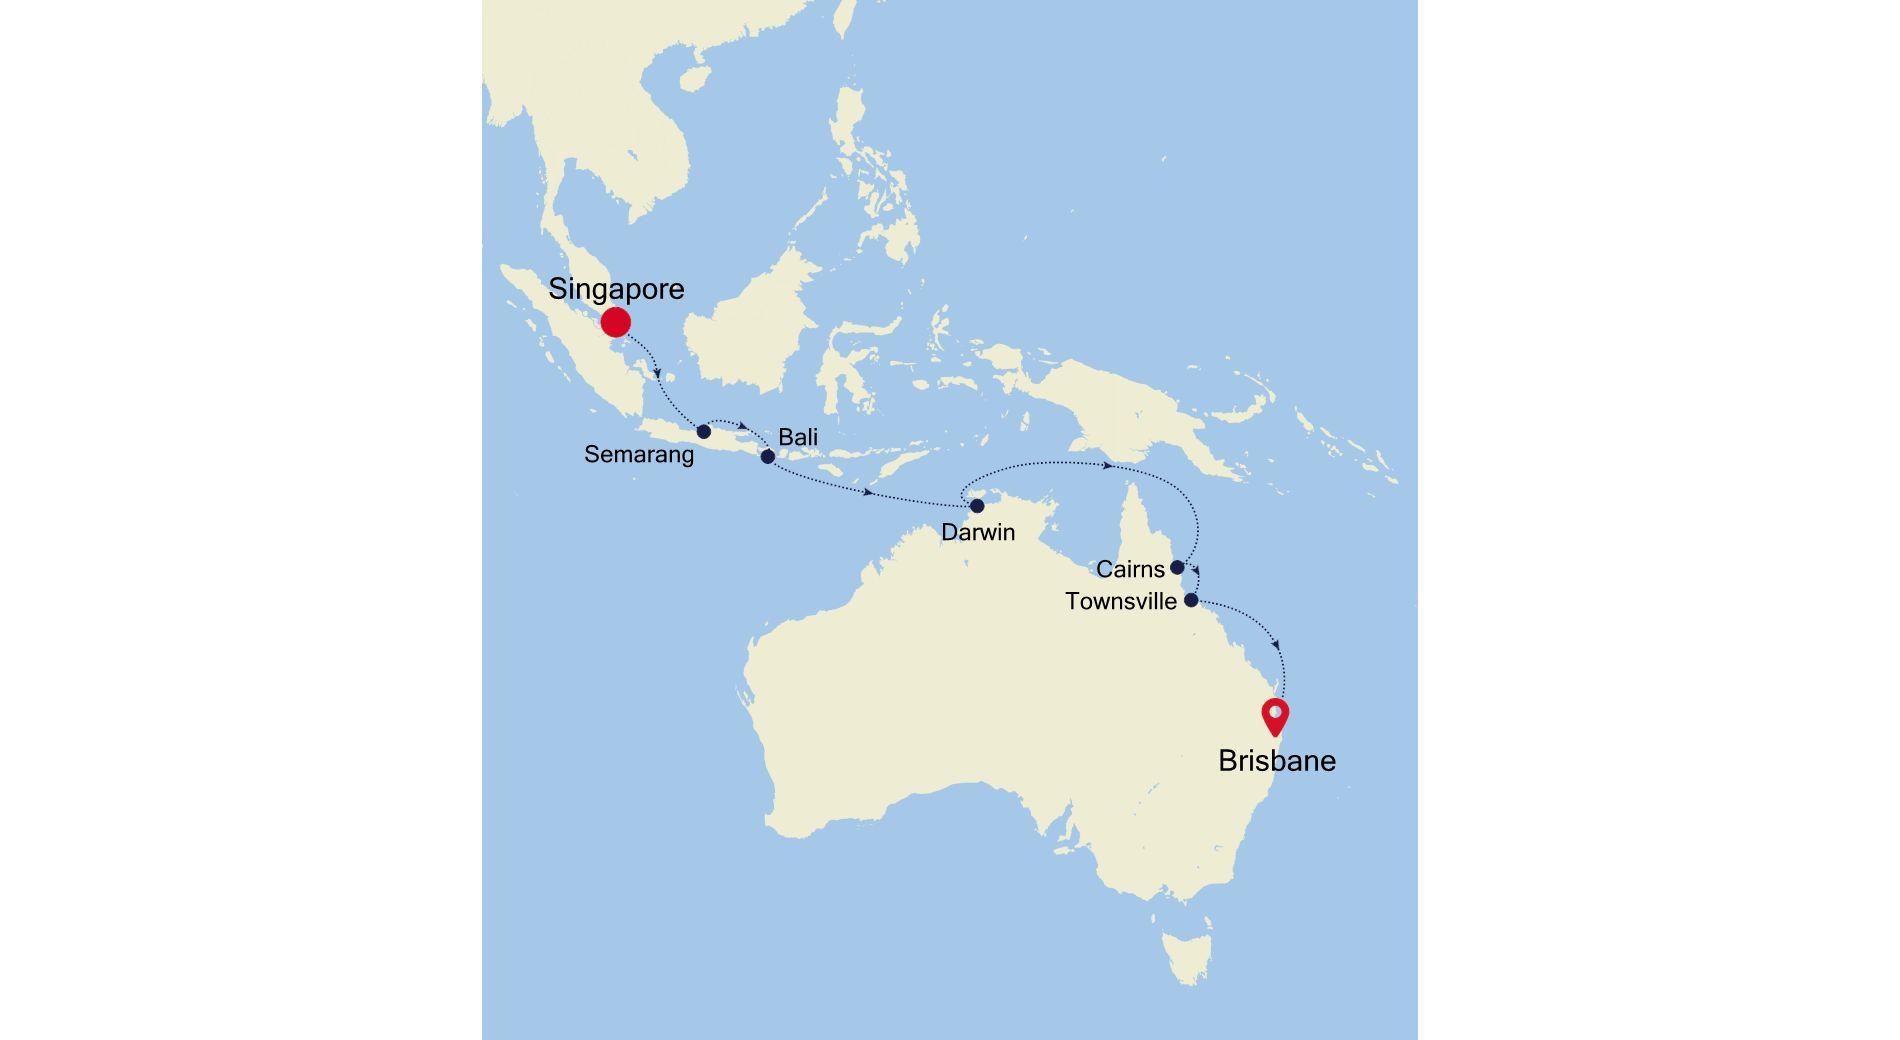 6930A - Singapore to Brisbane